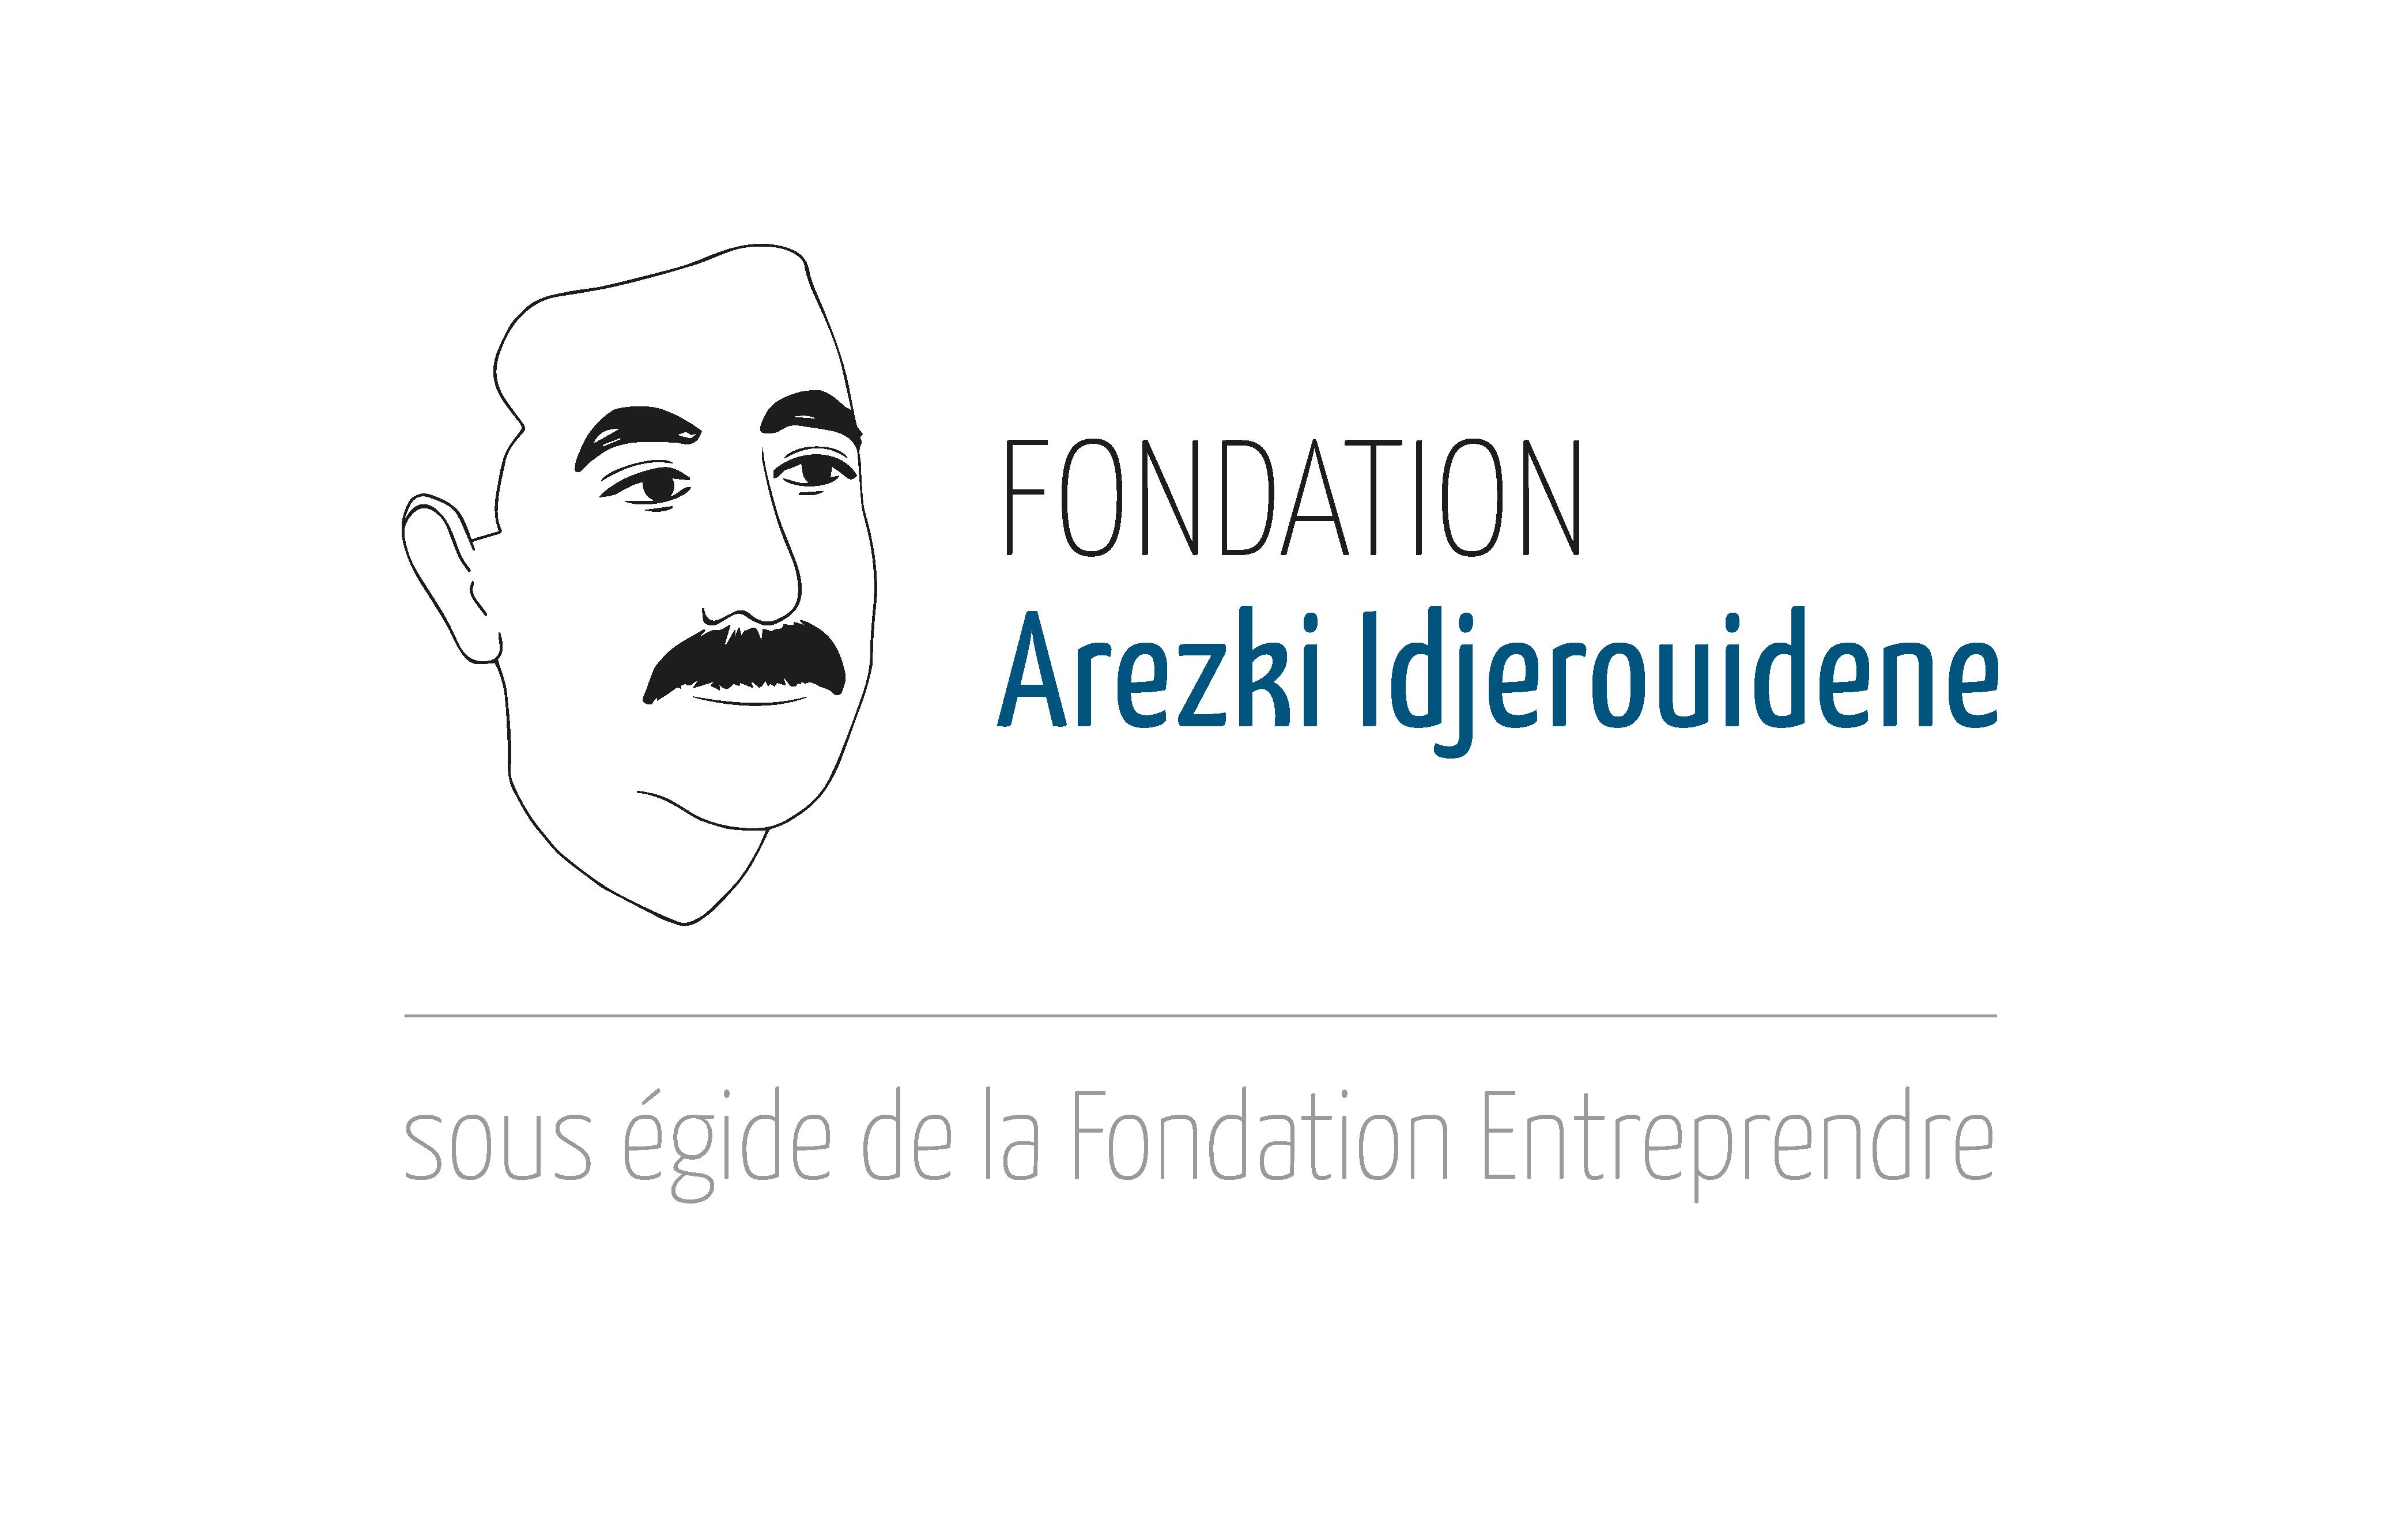 Logo fondation Arezki Idjerouidene